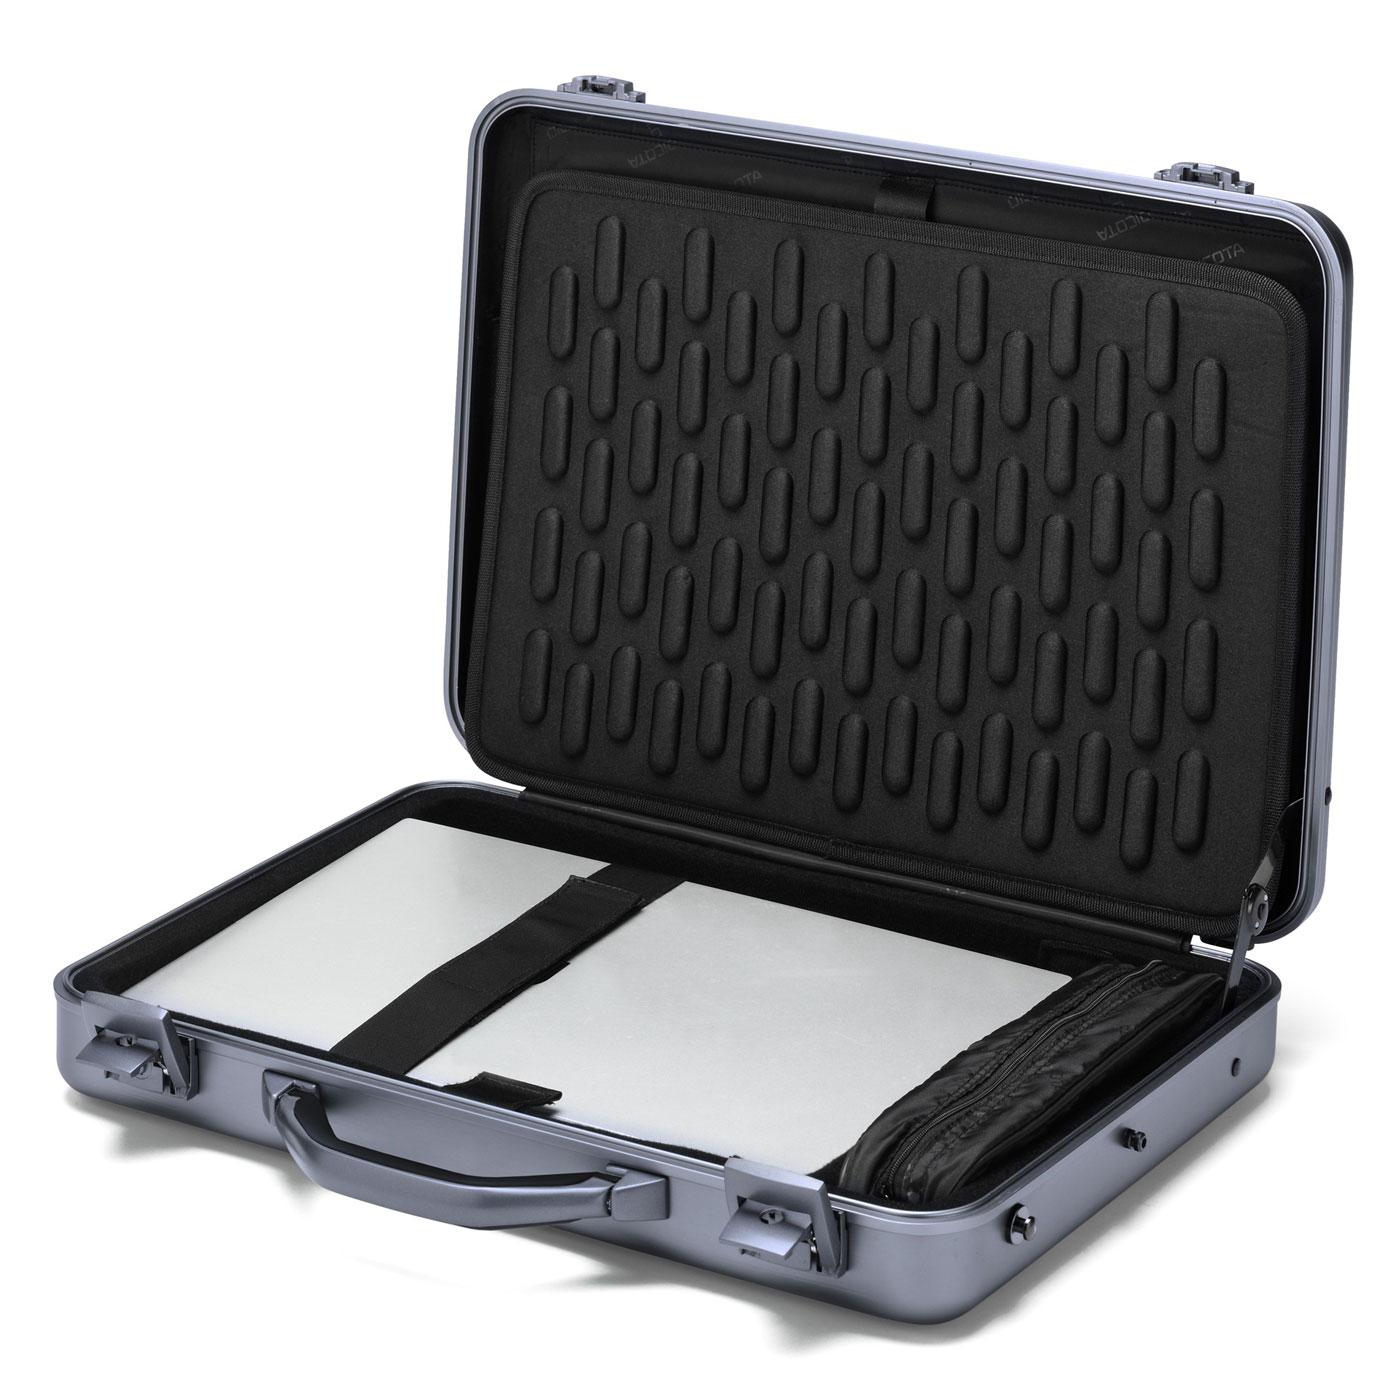 dicota alu briefcase 16 17 sac sacoche housse dicota sur. Black Bedroom Furniture Sets. Home Design Ideas